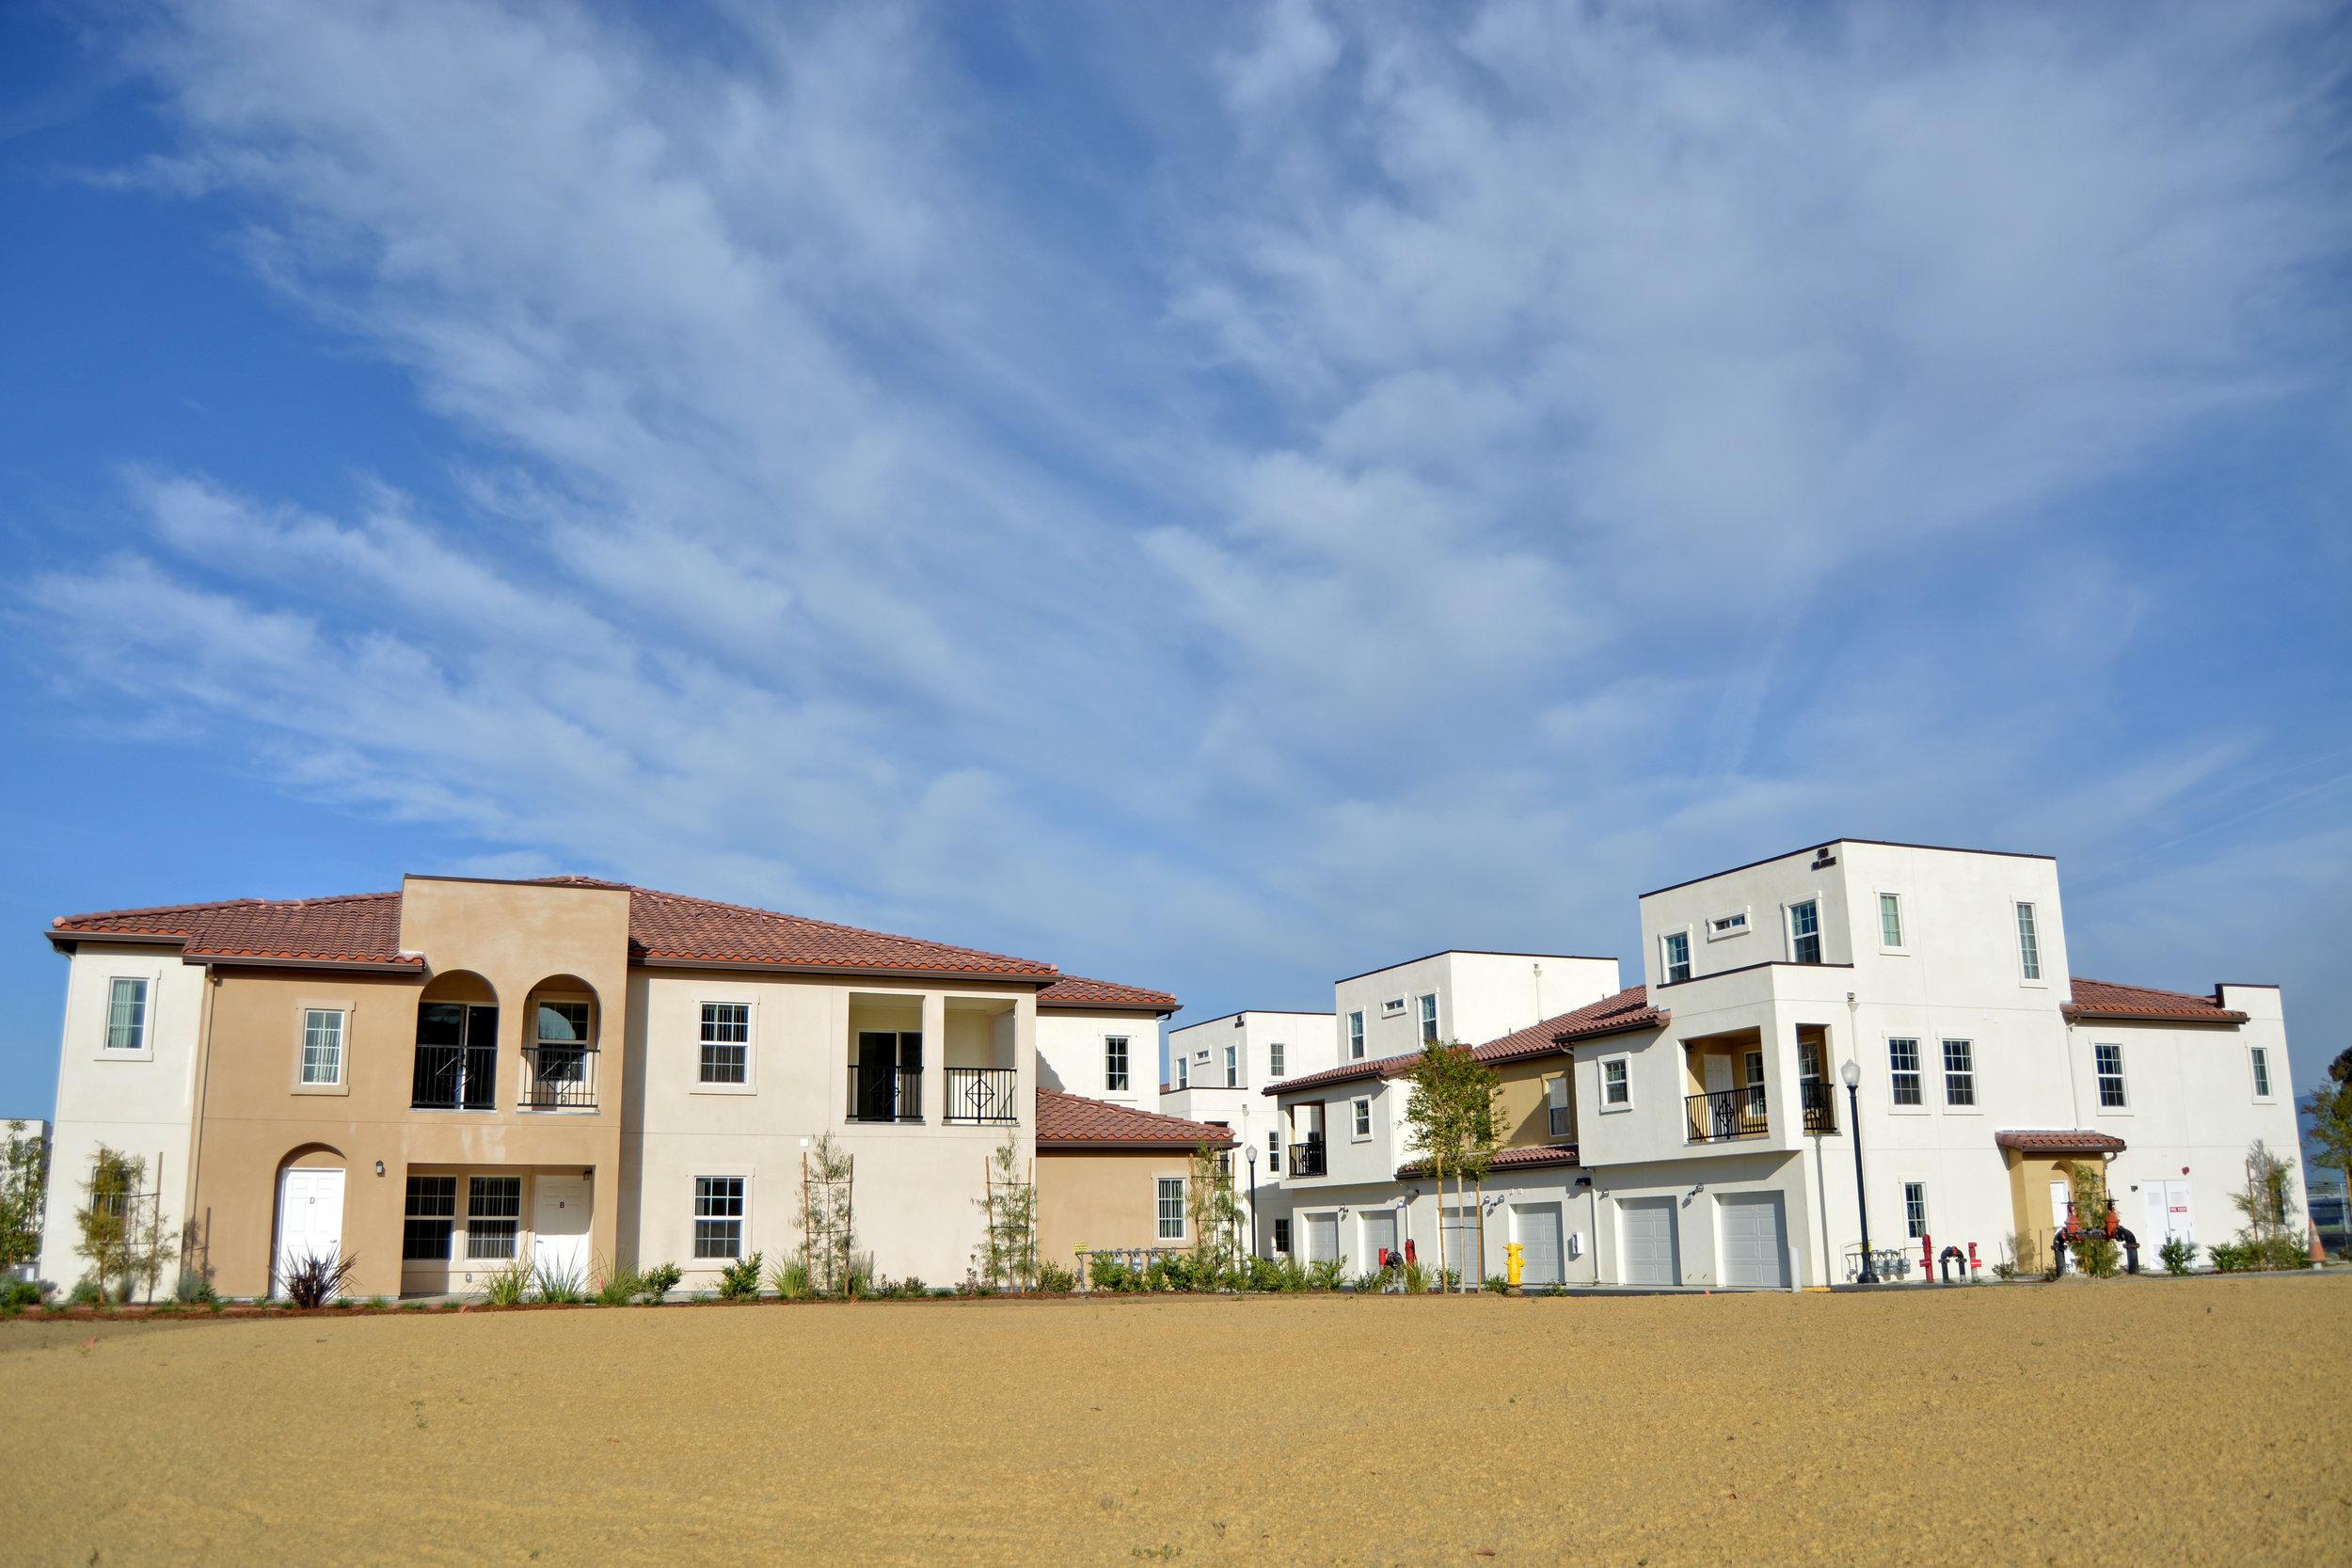 Valencia Grove Housing Community